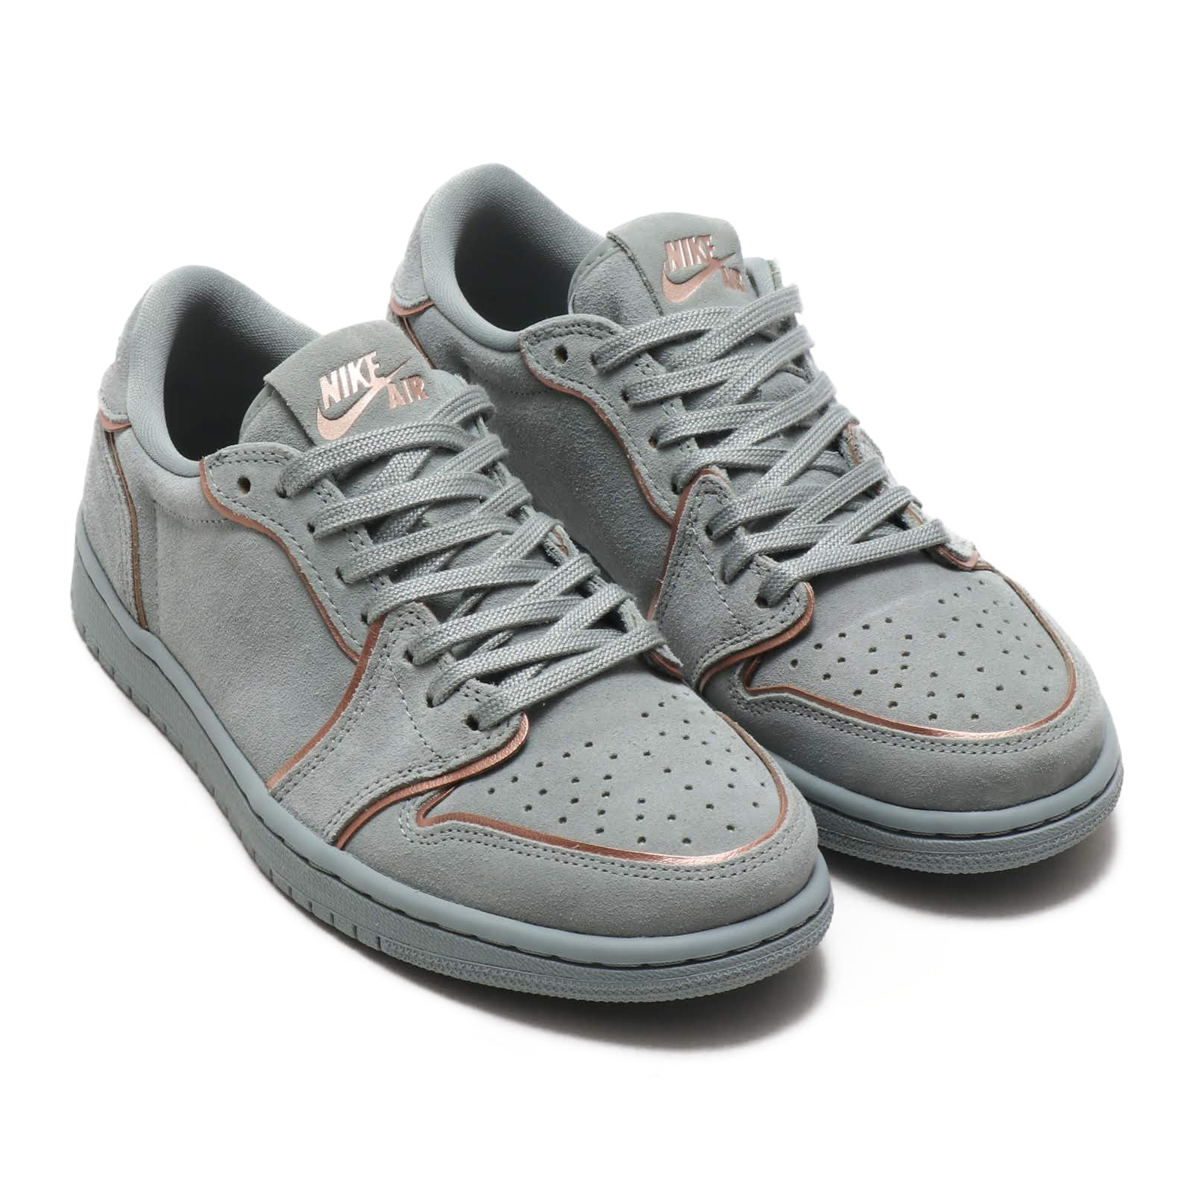 97f249c89ce ... NIKE WMNS AIR JORDAN 1 RETRO LOW NS (Nike women Air Jordan 1 nostalgic  low ...